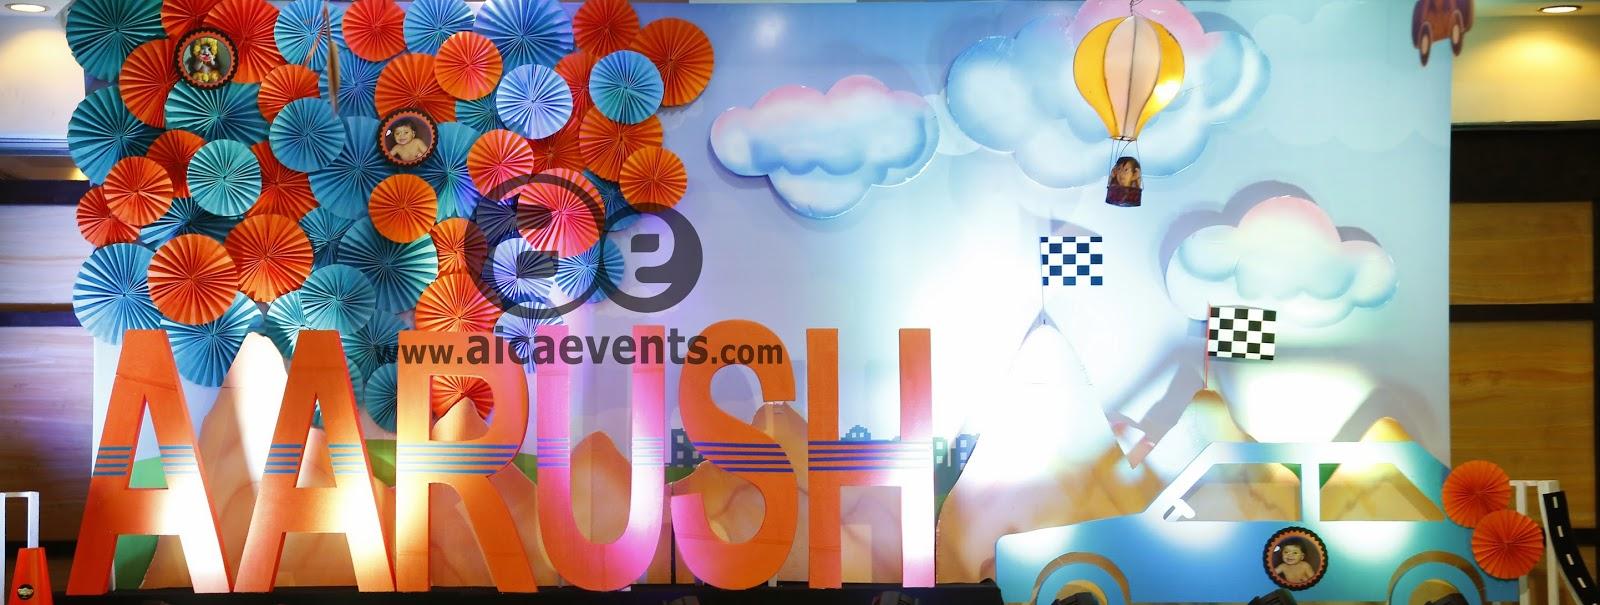 aicaevents Aarush 1st Birthday Celebrations